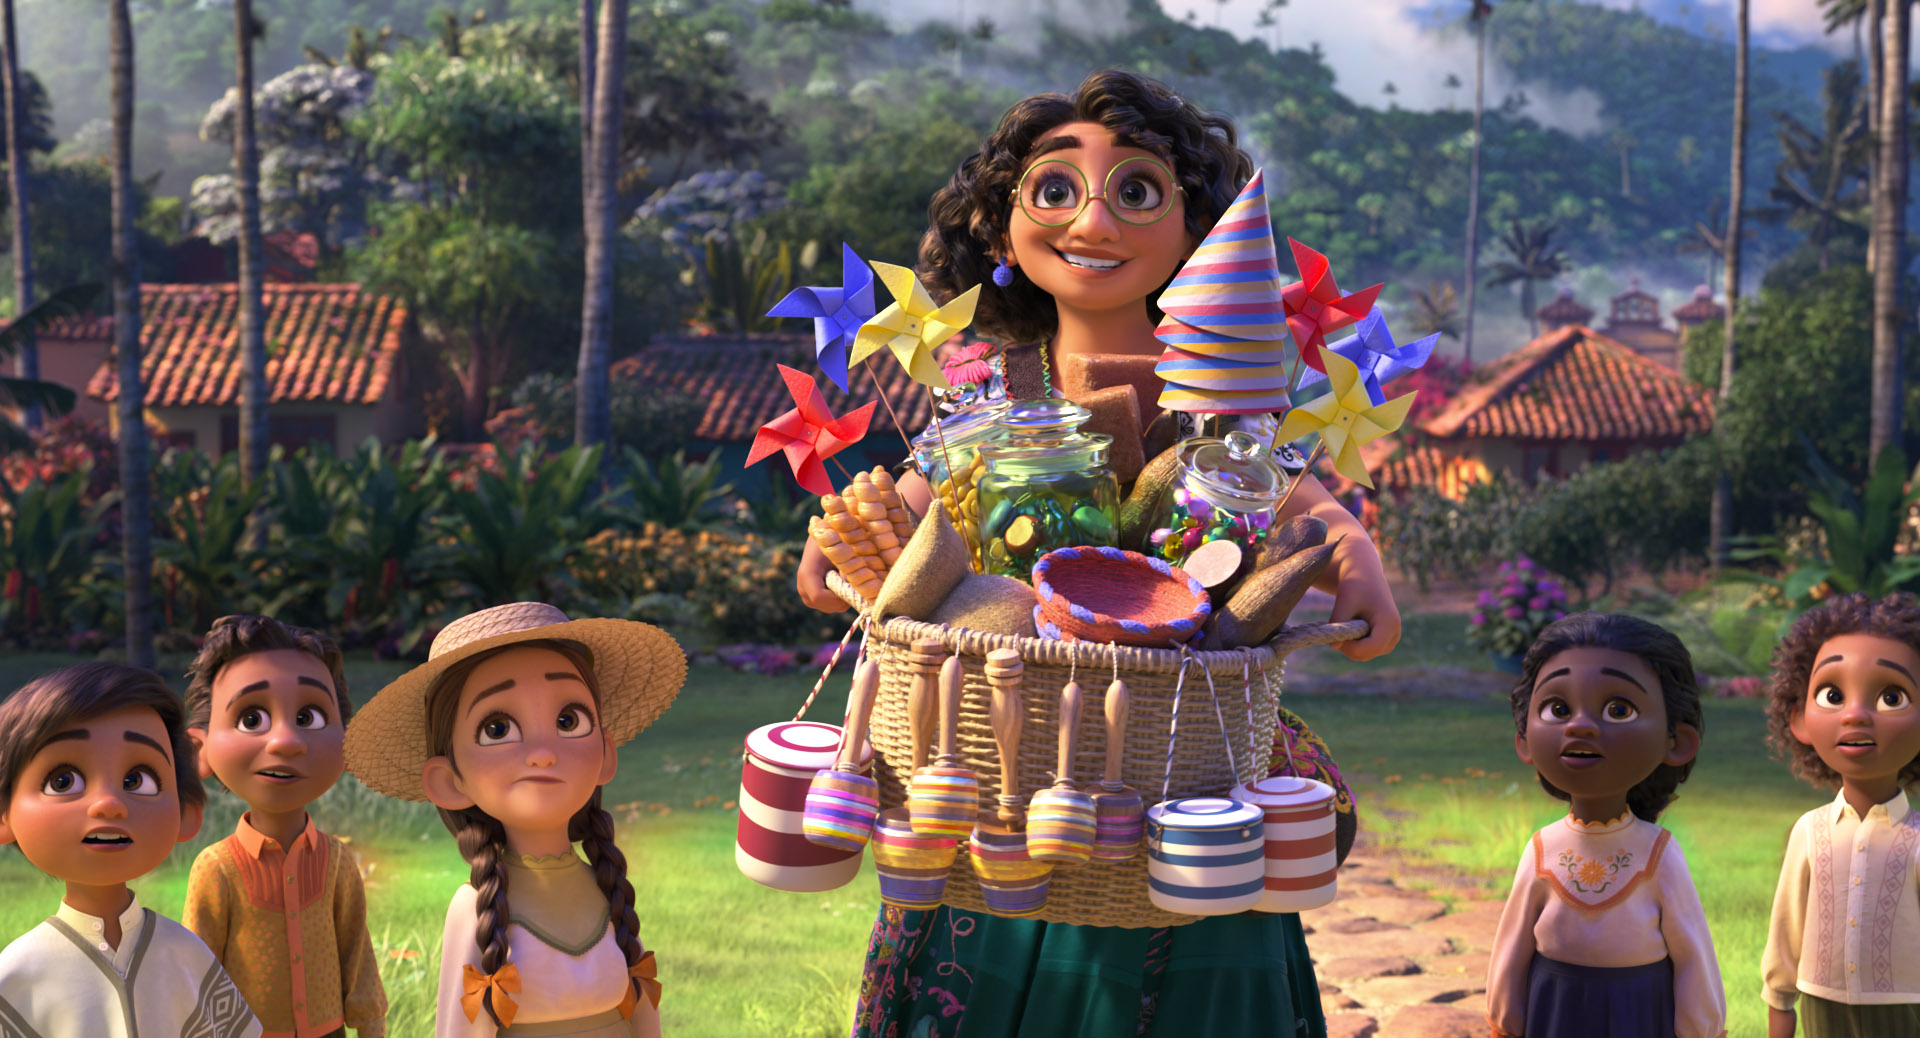 ¡Disney revela el primer tráiler de ENCANTO!